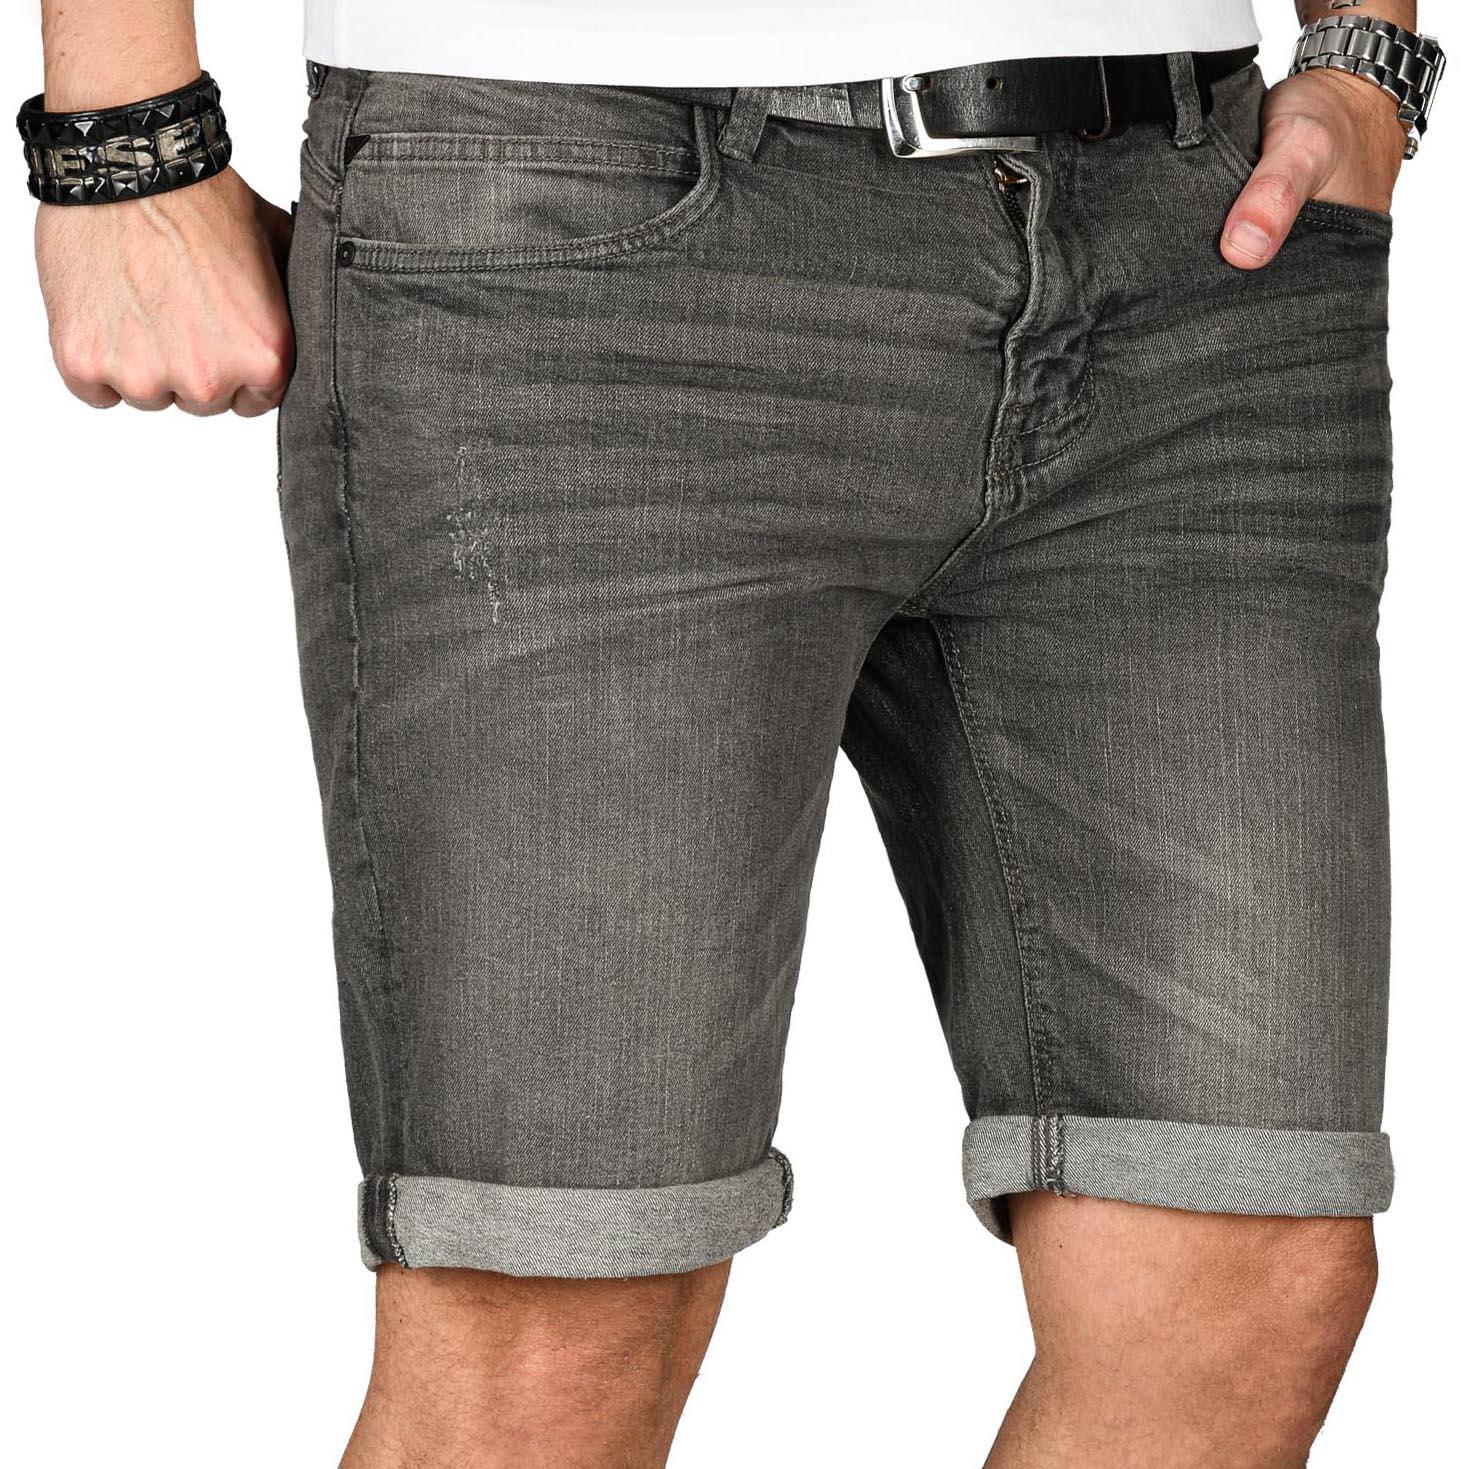 Indicode-Herren-Sommer-Bermuda-Jeans-Shorts-kurze-Hose-Sommerhose-Short-Neu-B556 Indexbild 25